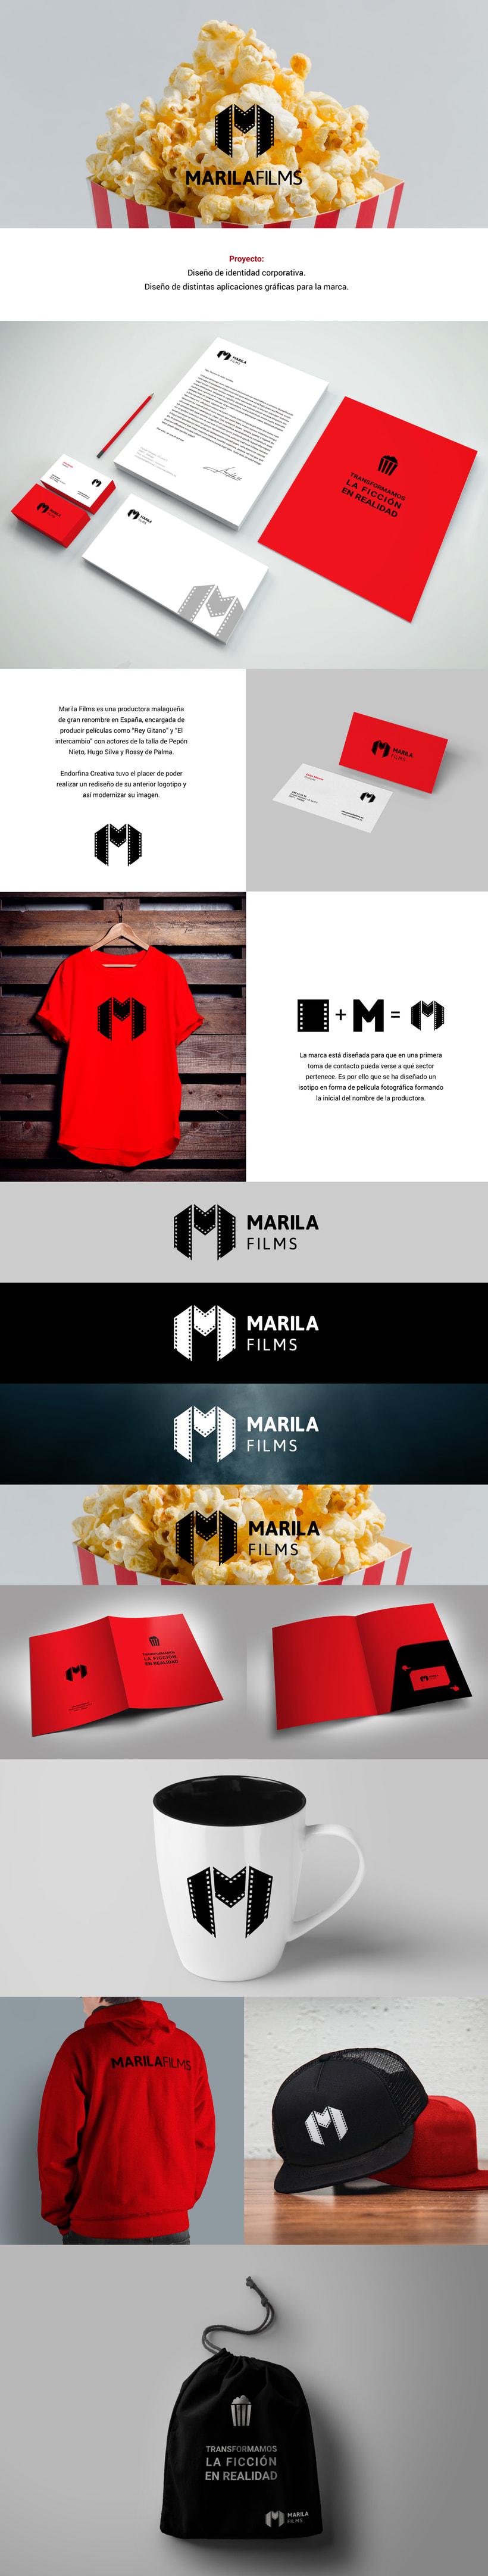 Identidad corporativa para MARILA FILMS 0